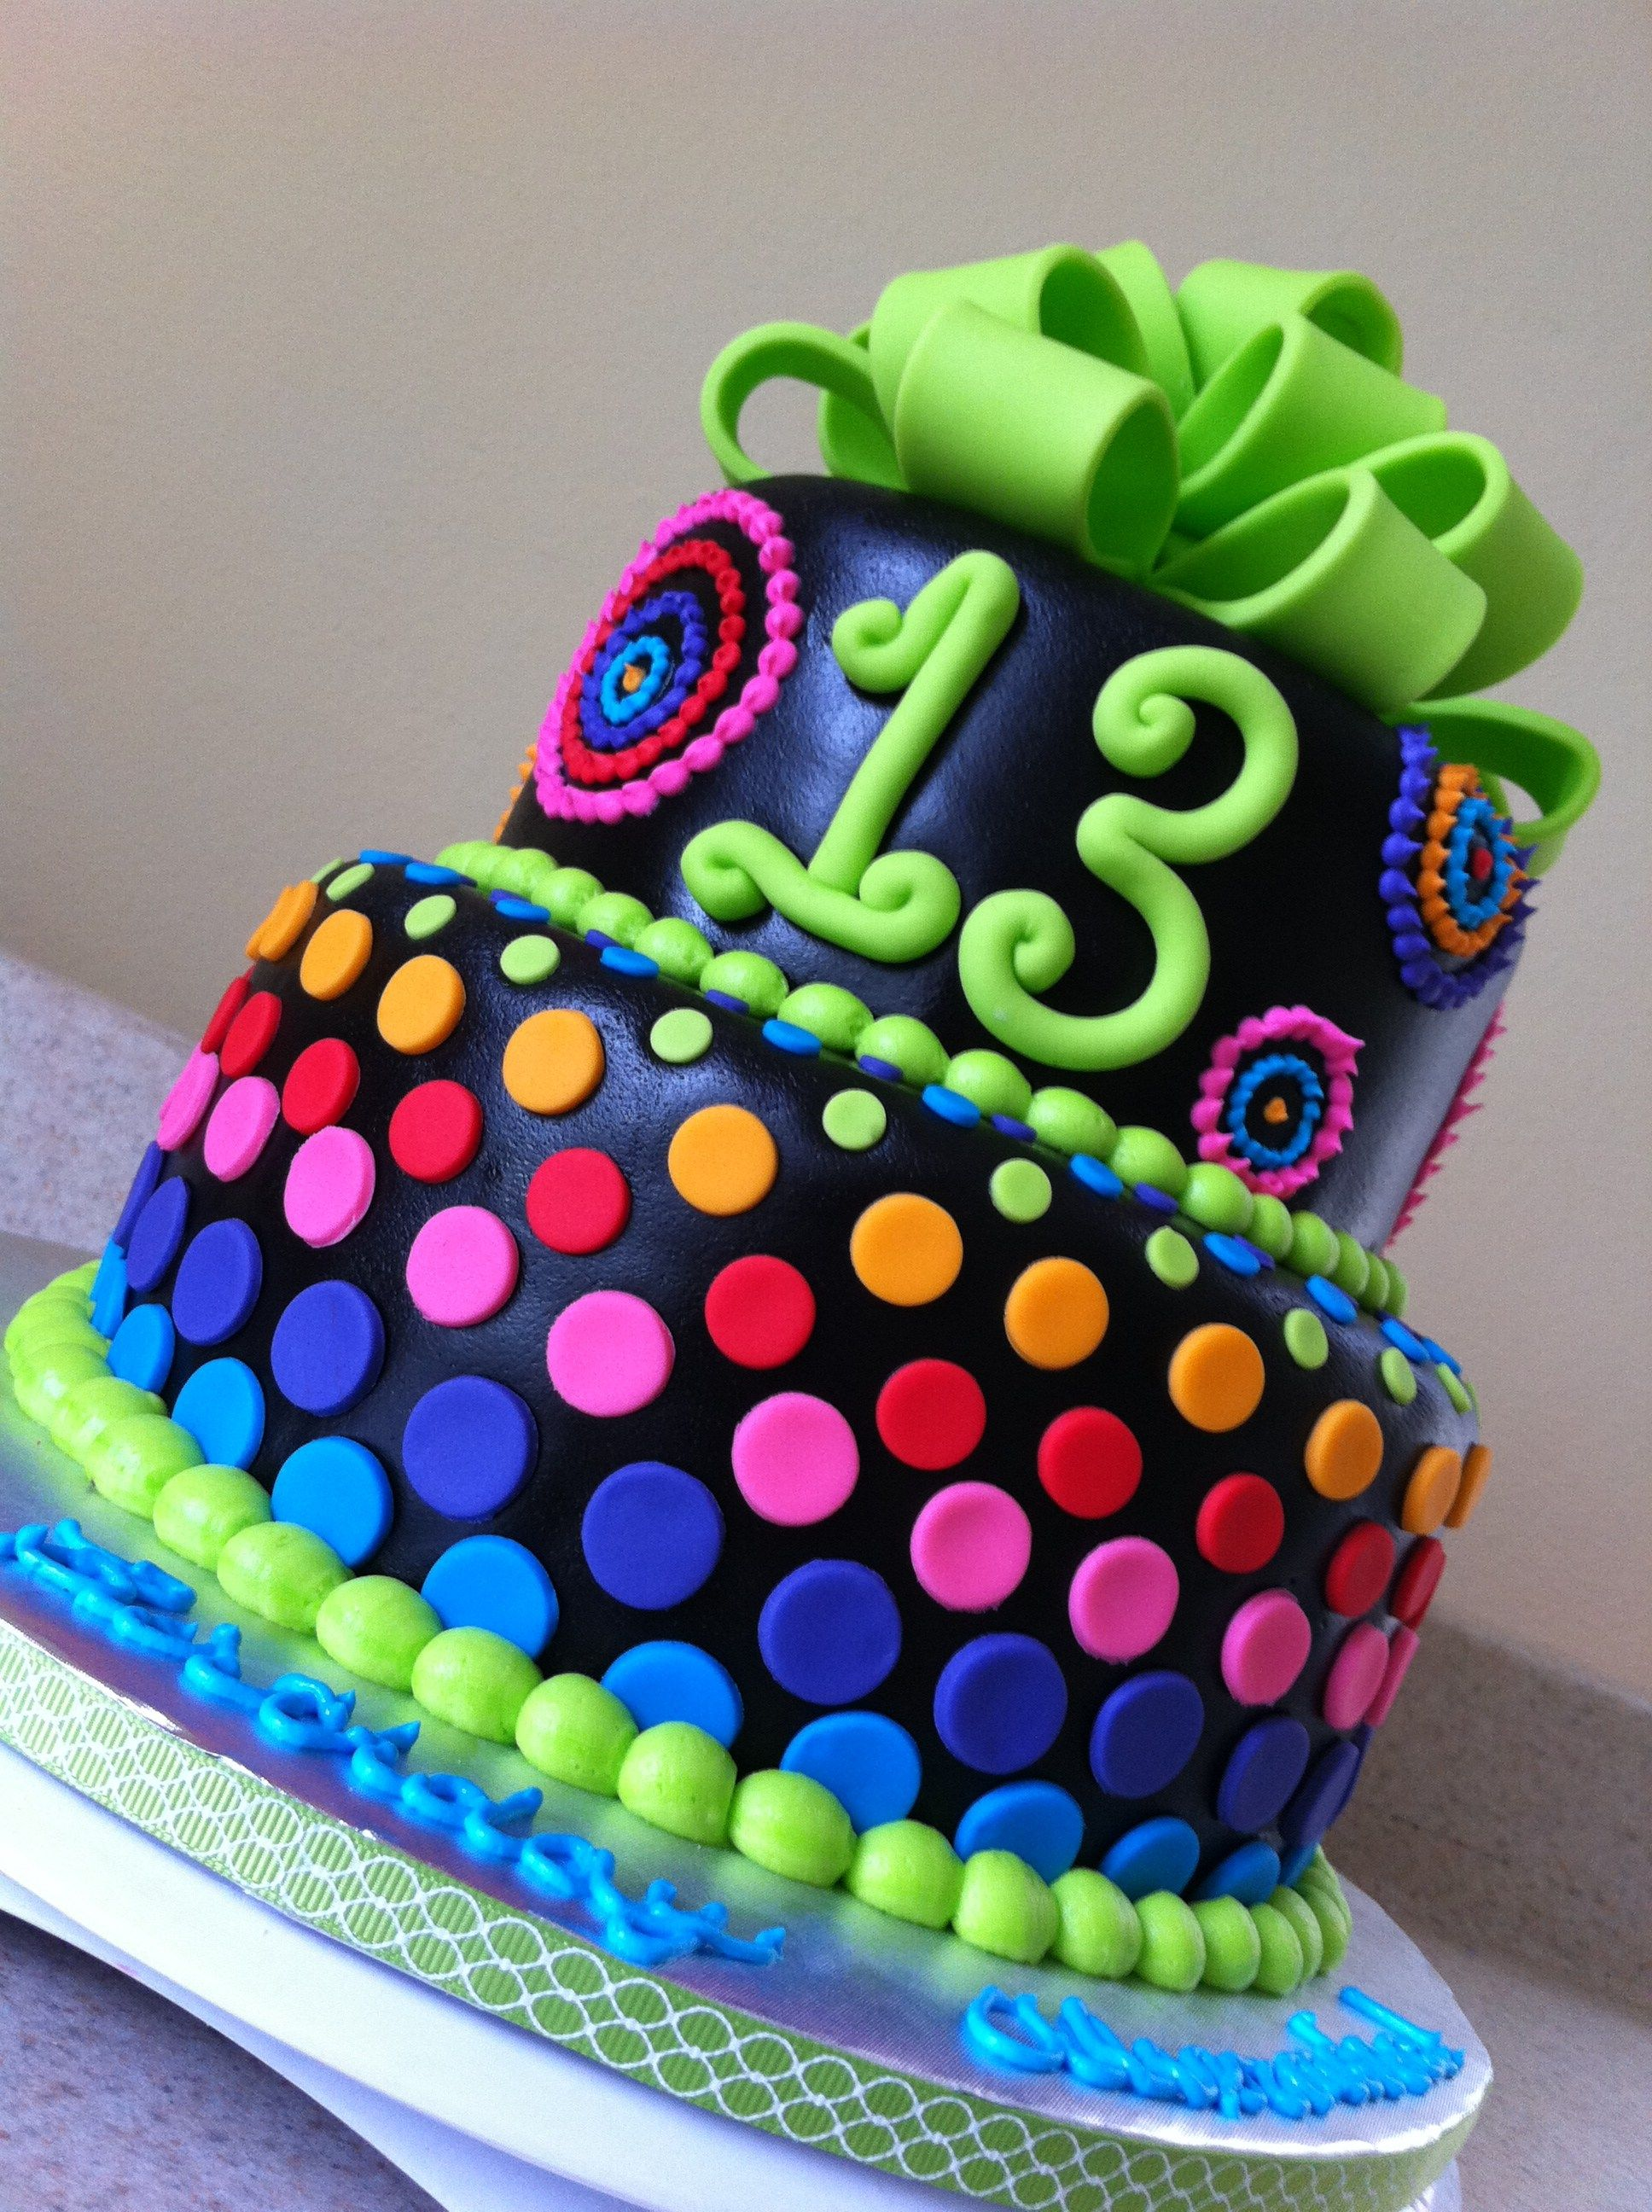 30 elegant image of cool birthday cake ideas neon